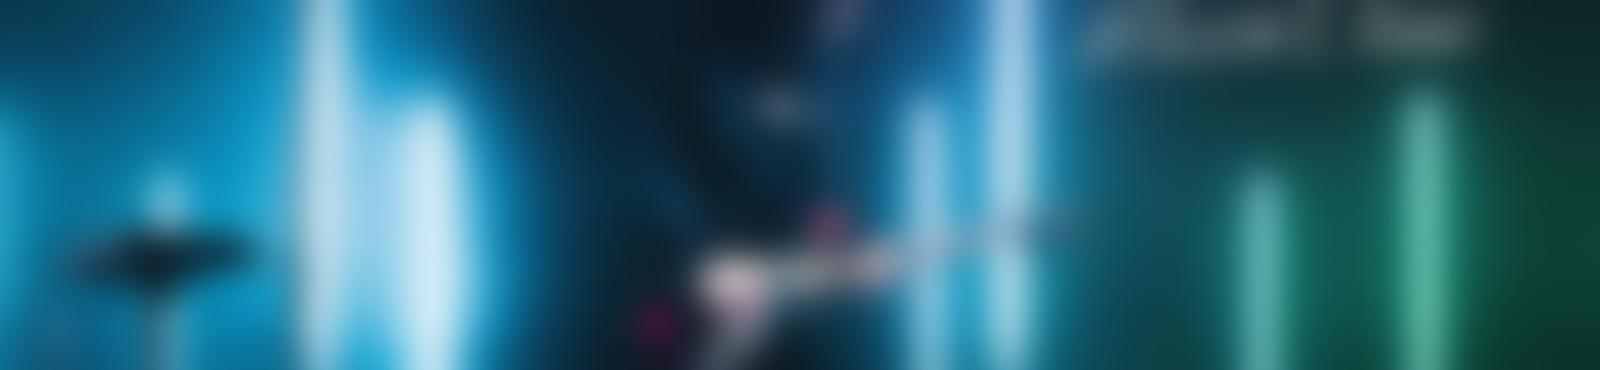 Blurred 47c005df cb49 4555 986b 94dbce769431